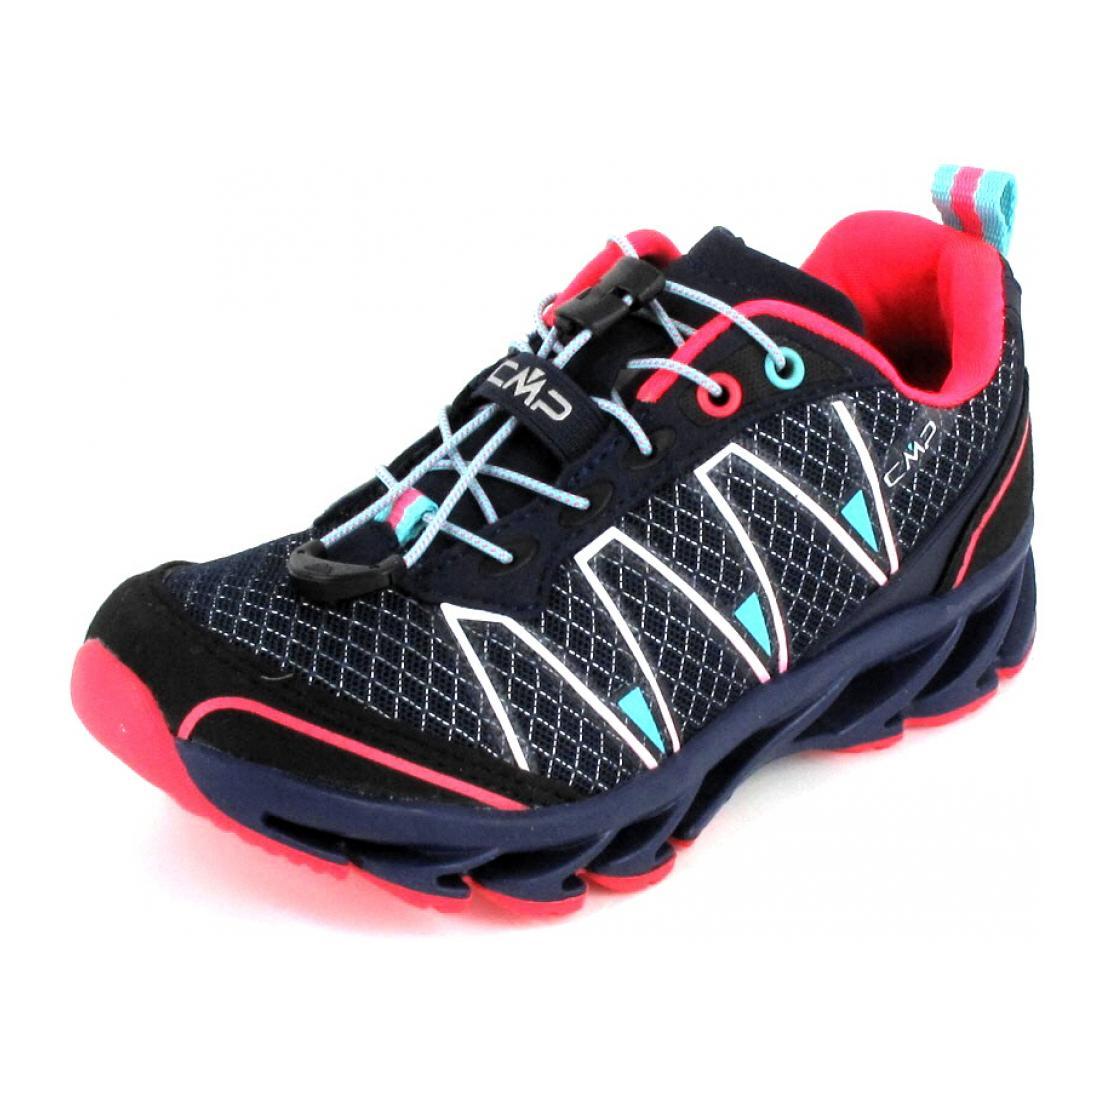 CMP Trekkingschuh Kids Altak Trail Shoe 2.0